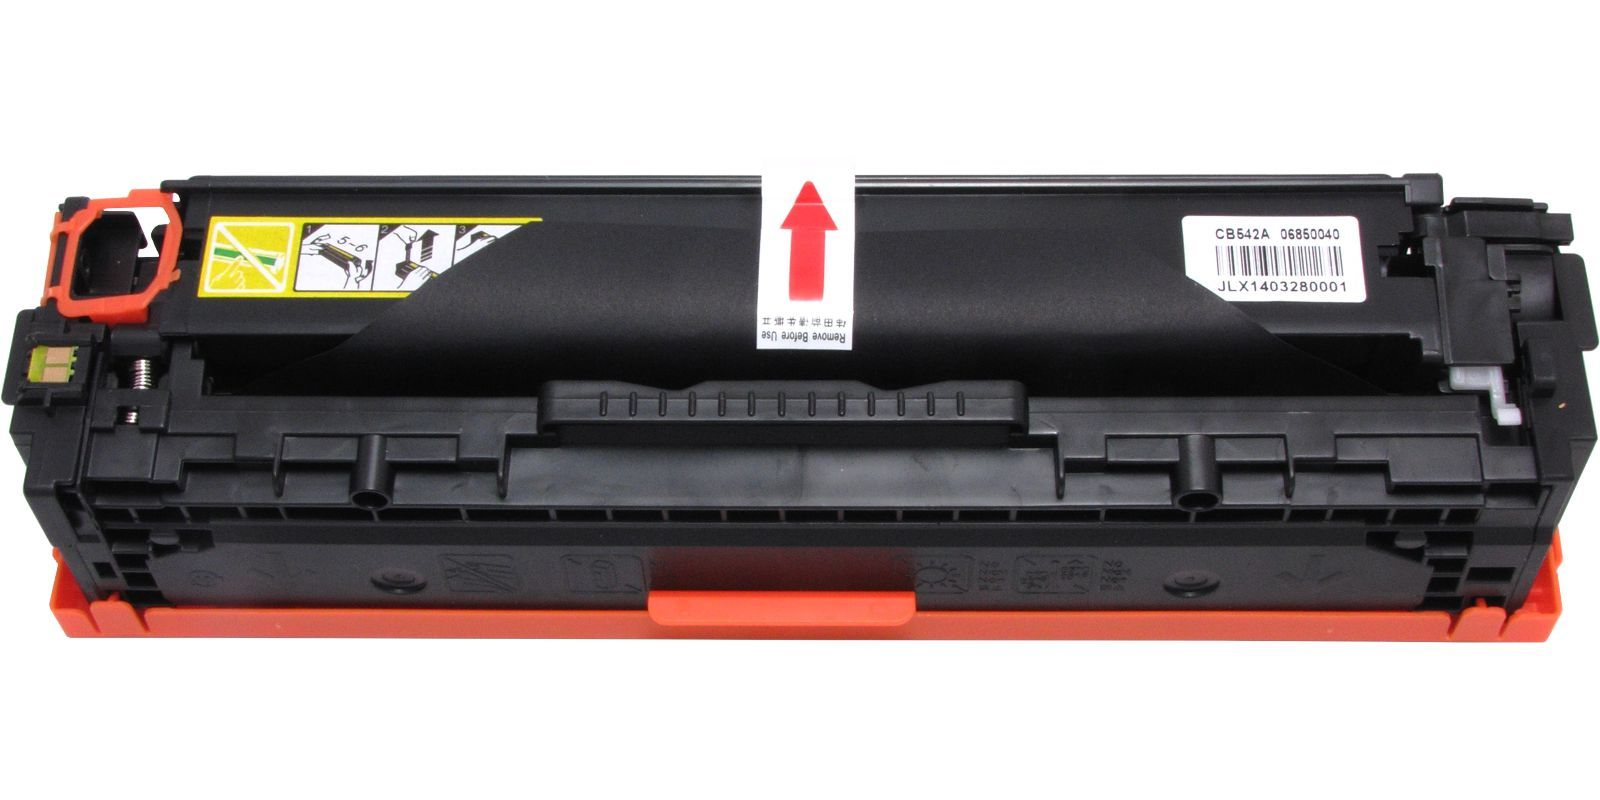 MAK №125A CB542A/Cartridge 316, 716, 416, 116 желтый (yellow), для HP/Canon, до 1400 стр.